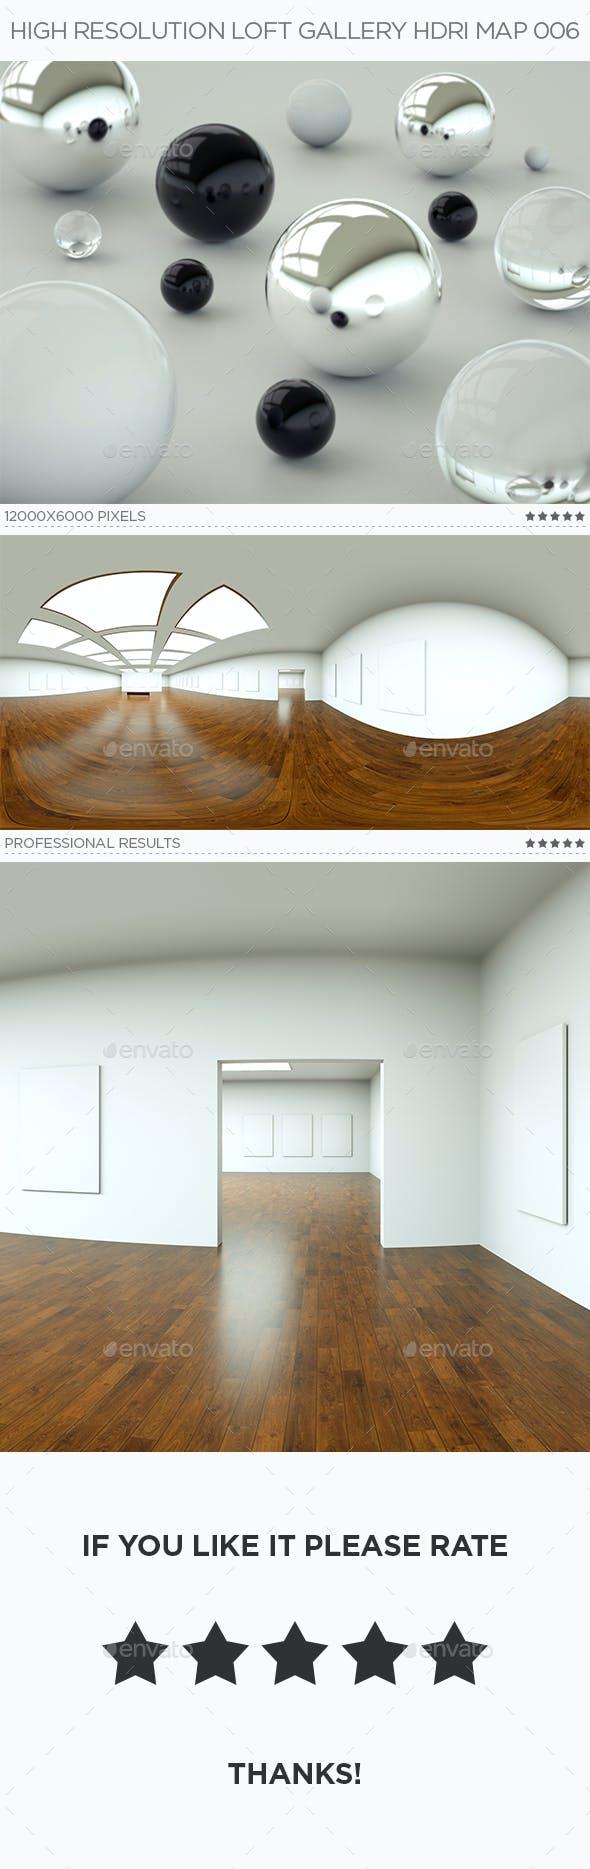 High Resolution Loft Gallery HDRi Map 006 - 3DOcean Item for Sale